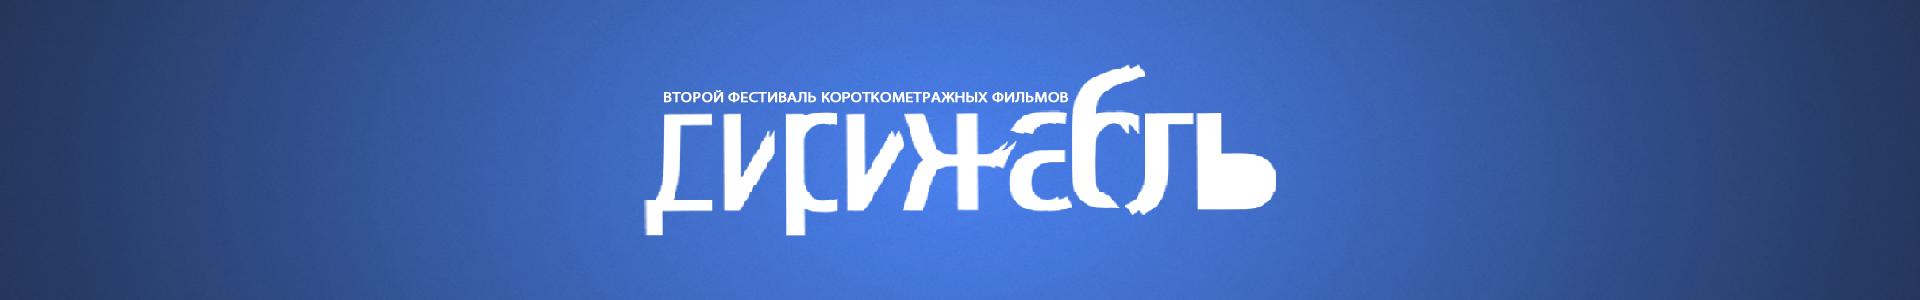 "Фестиваль ""Дирижабль"""